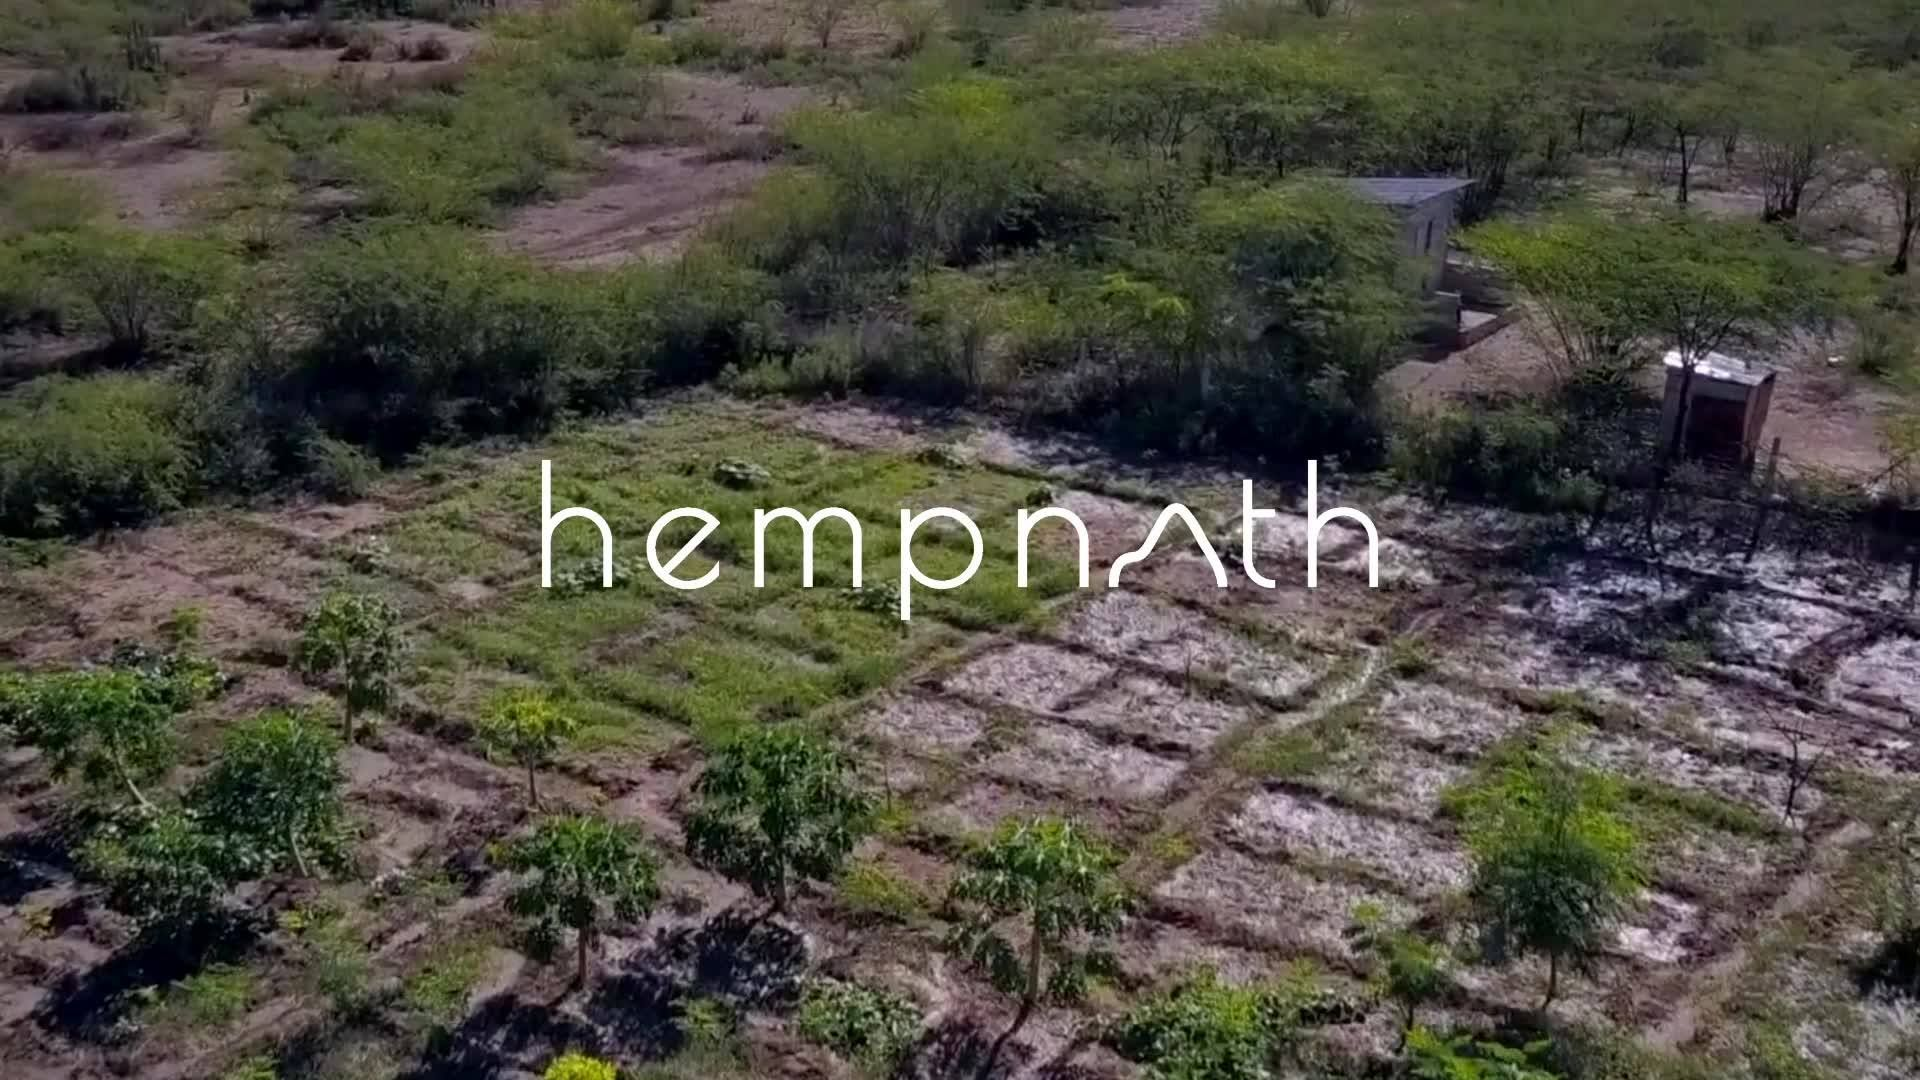 Hempnath